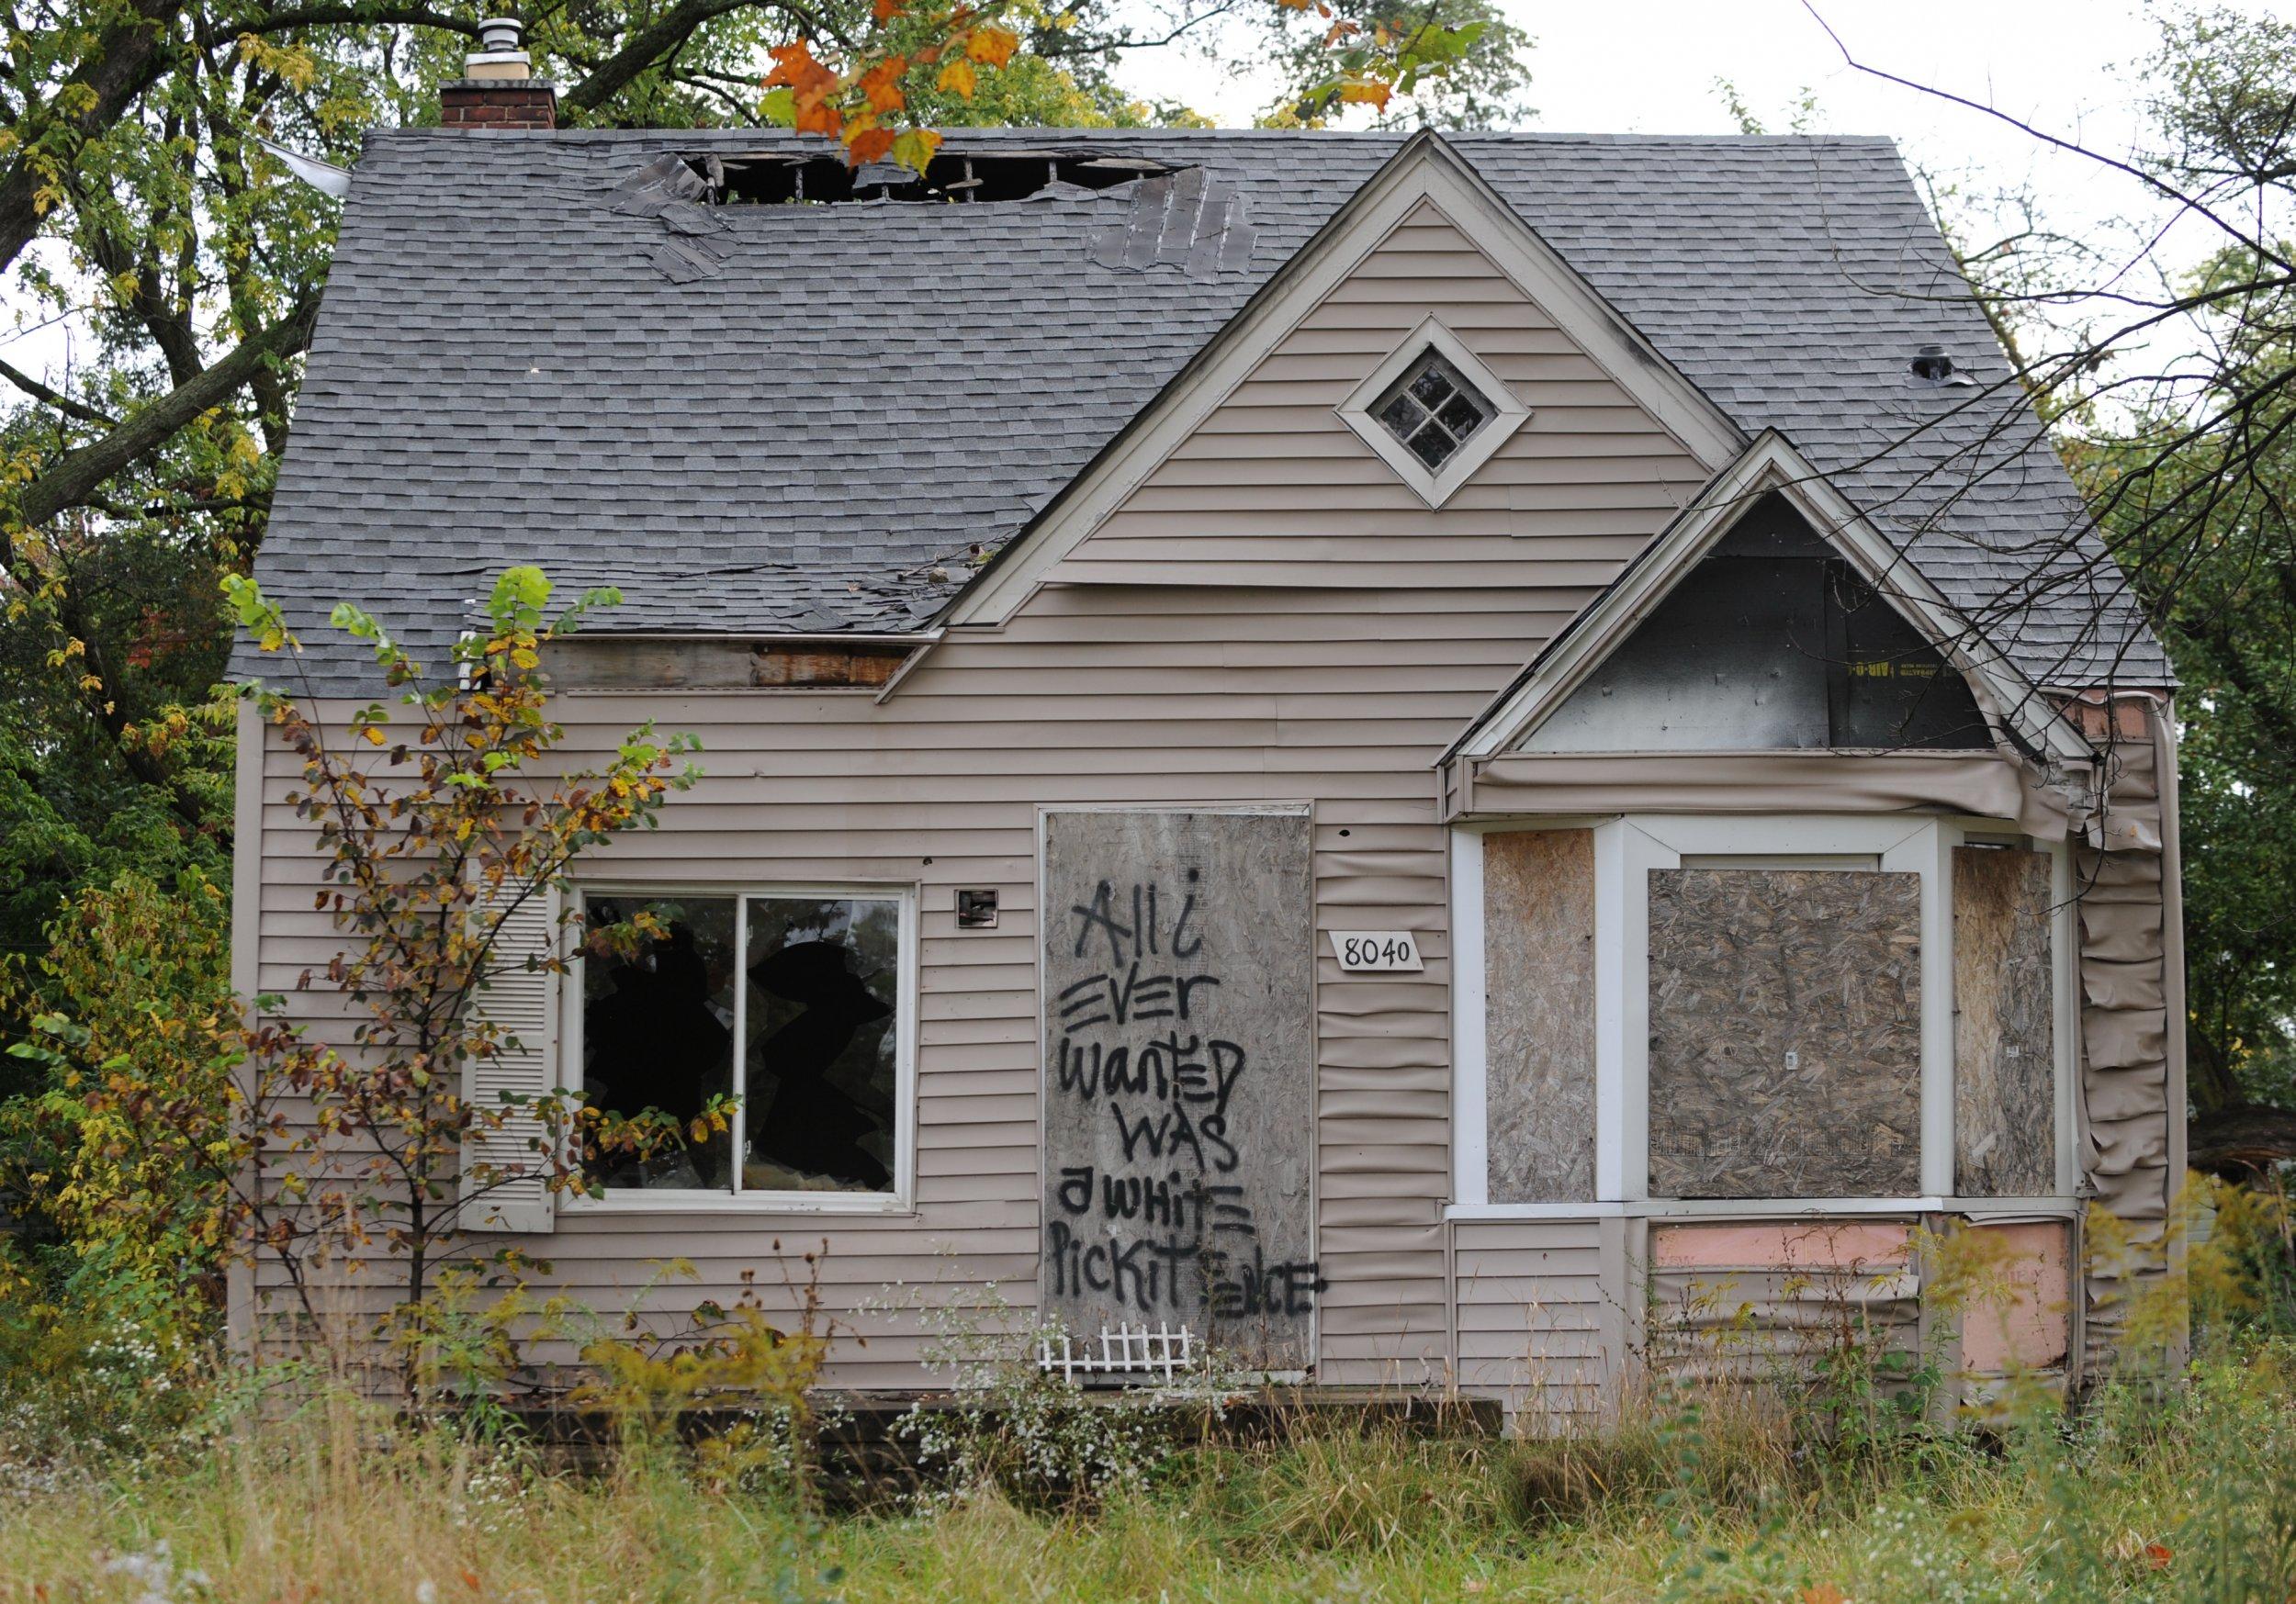 detroit abandoned house recession